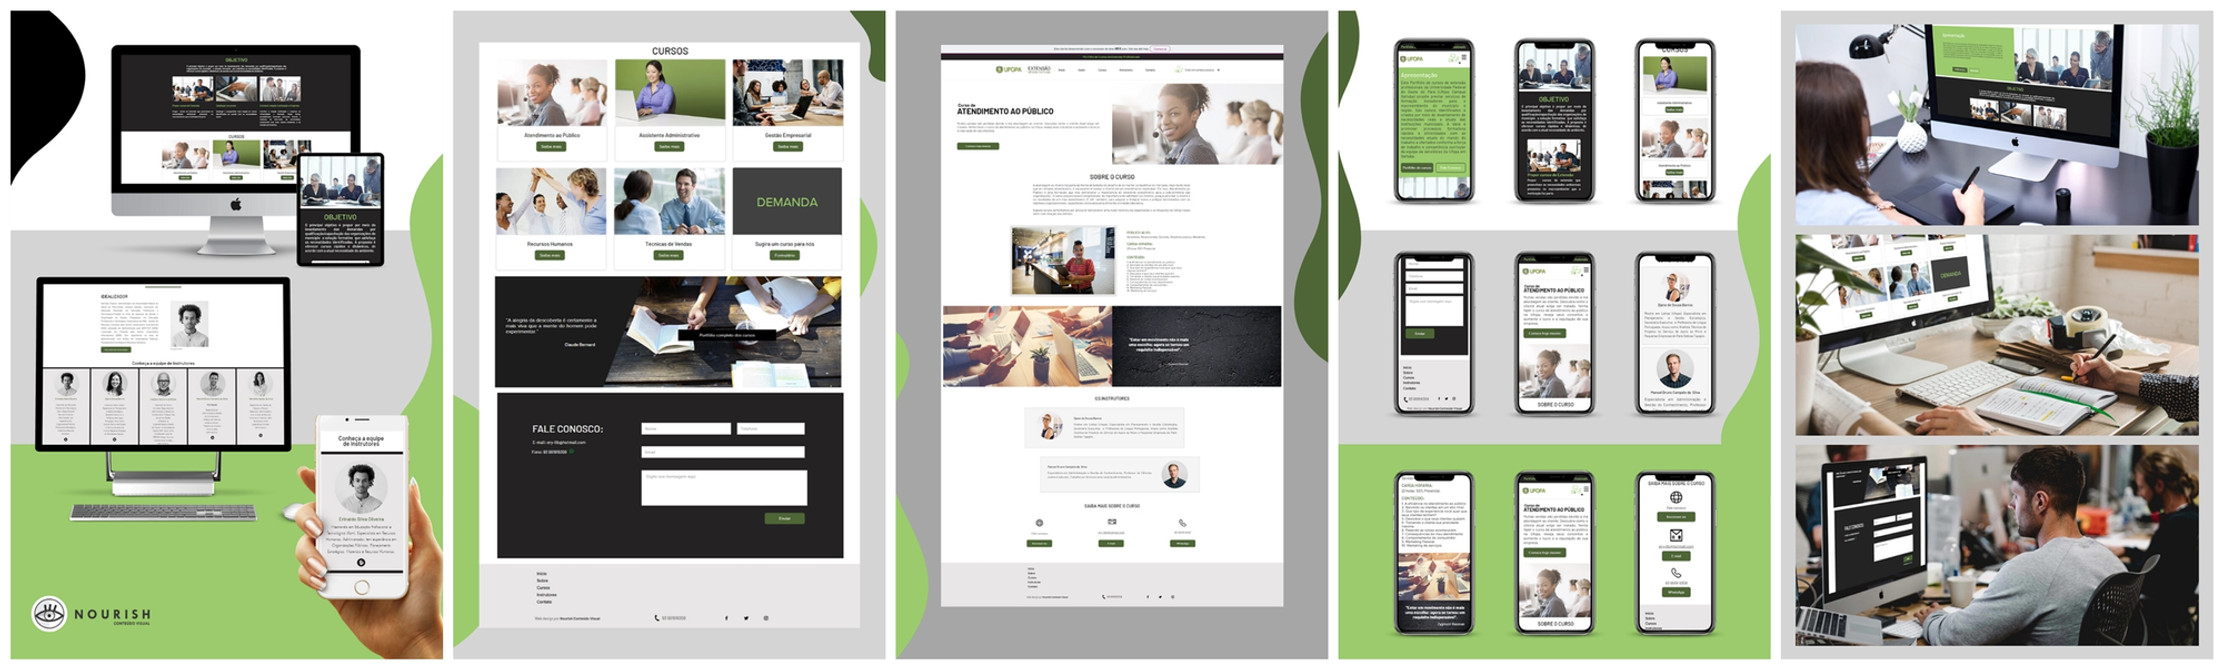 Web Design ~ Nourish Conteúdo Visual